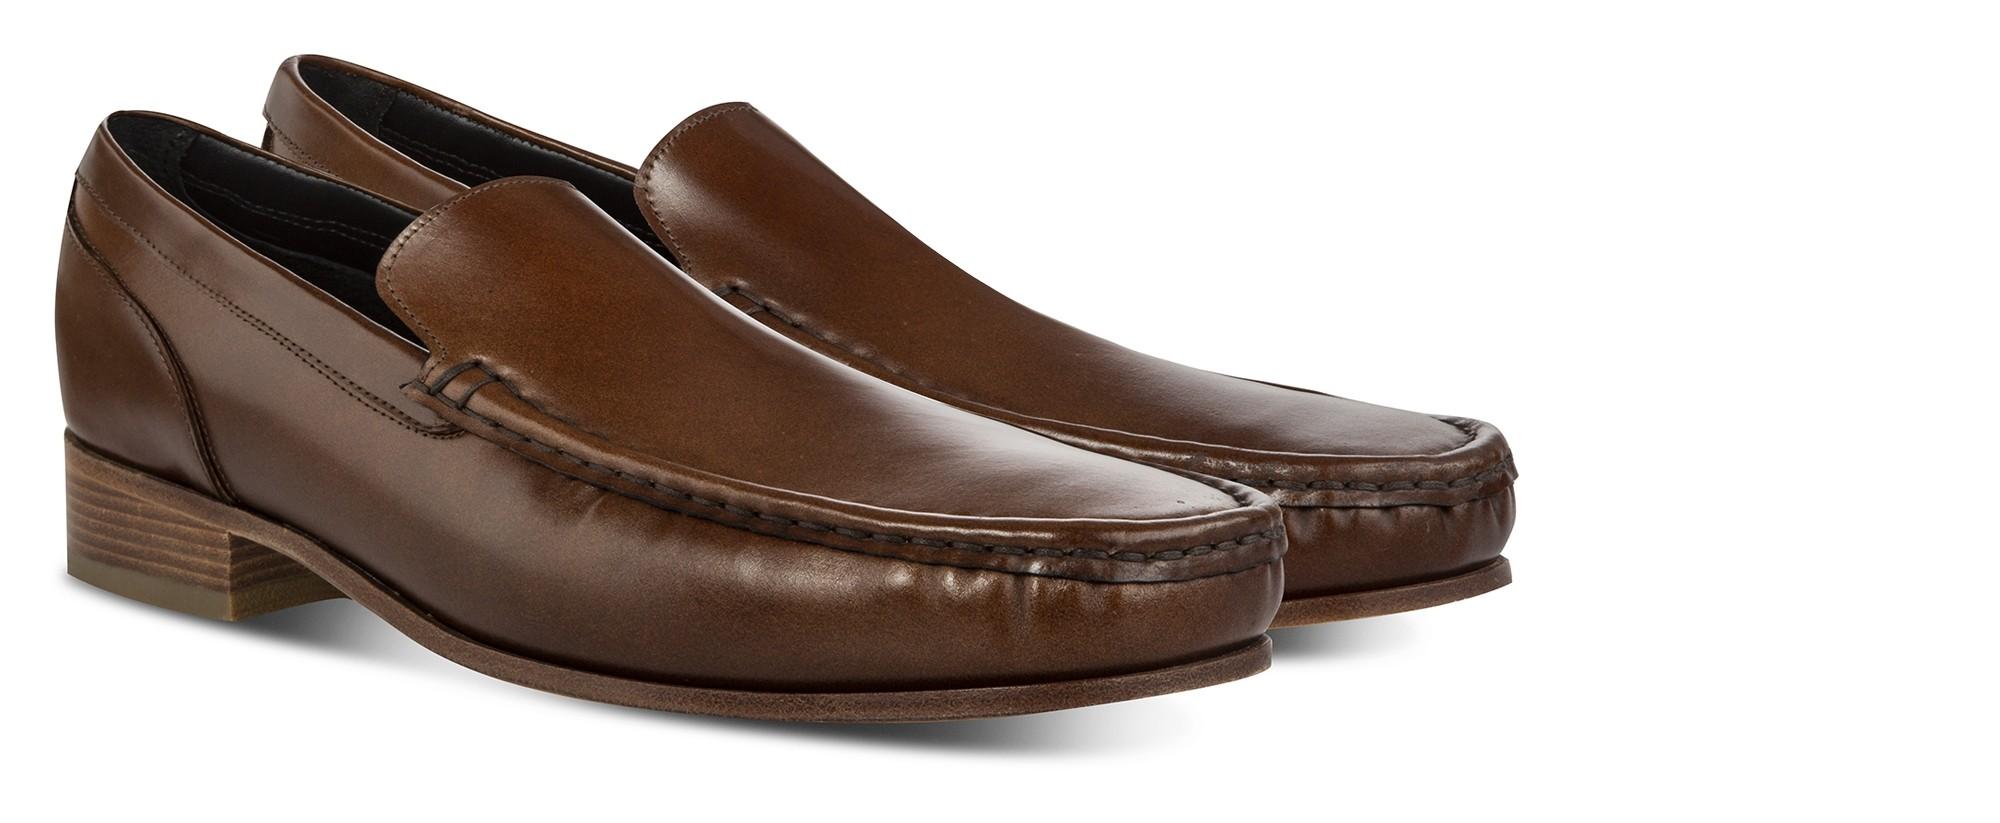 Fujaira elevator shoes